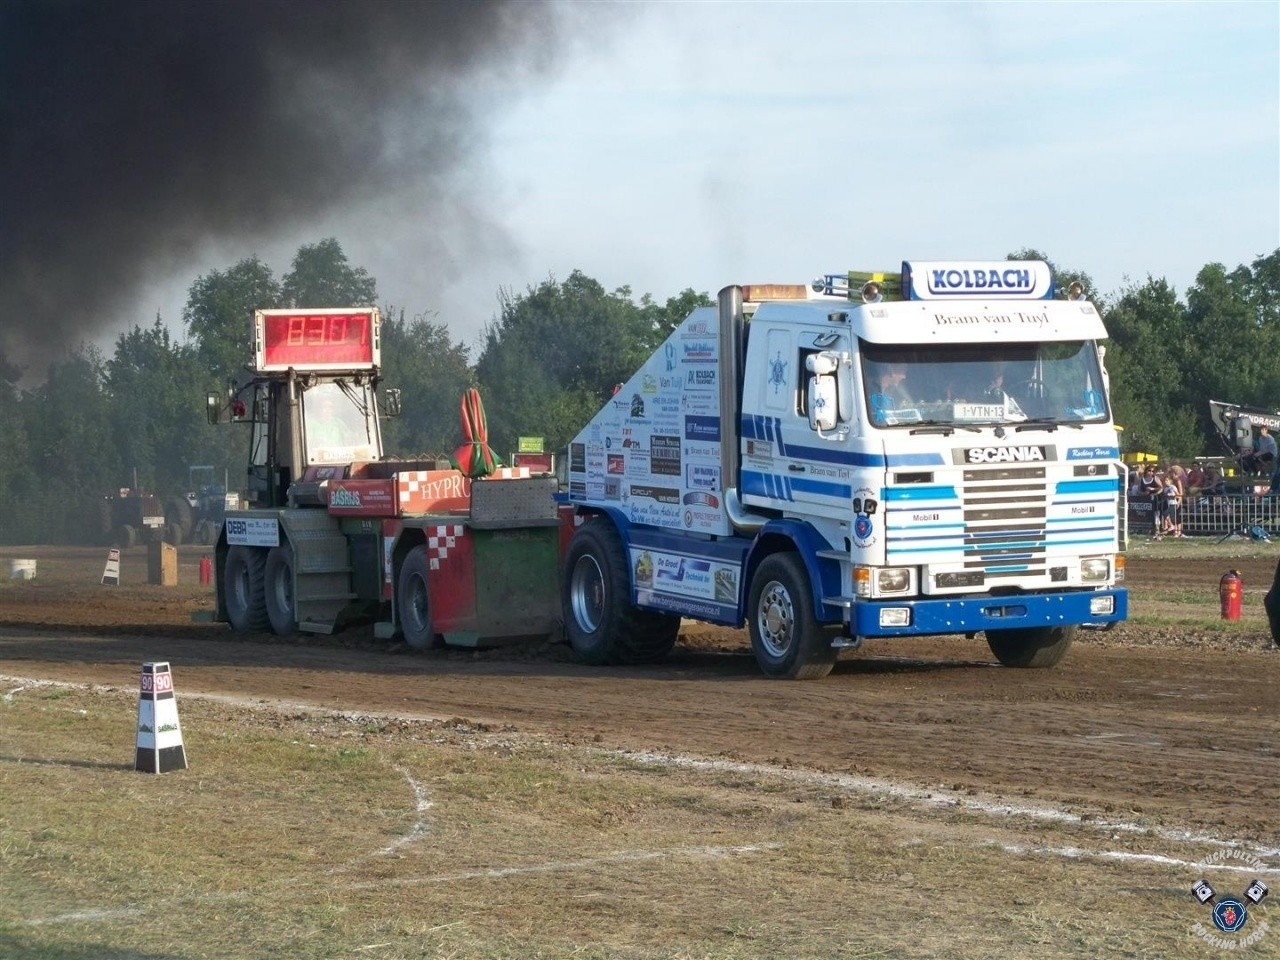 almkerk-2012-026